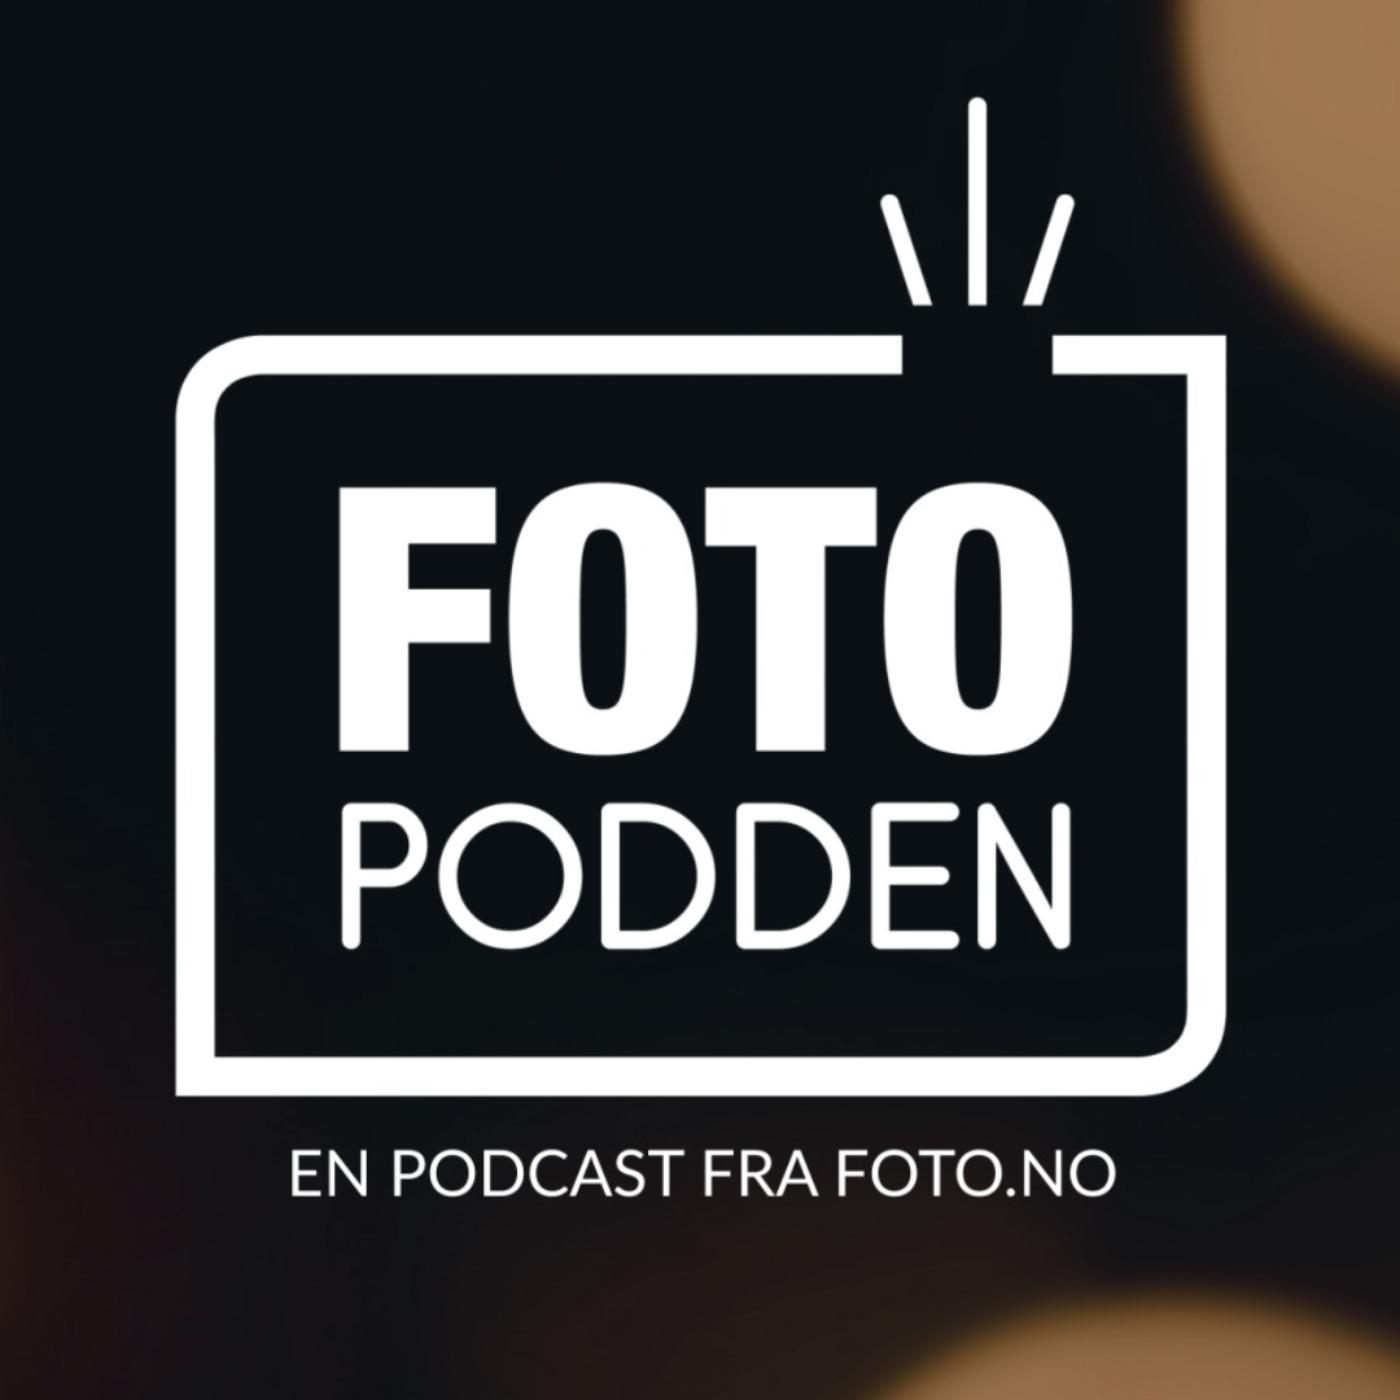 Fotopodden